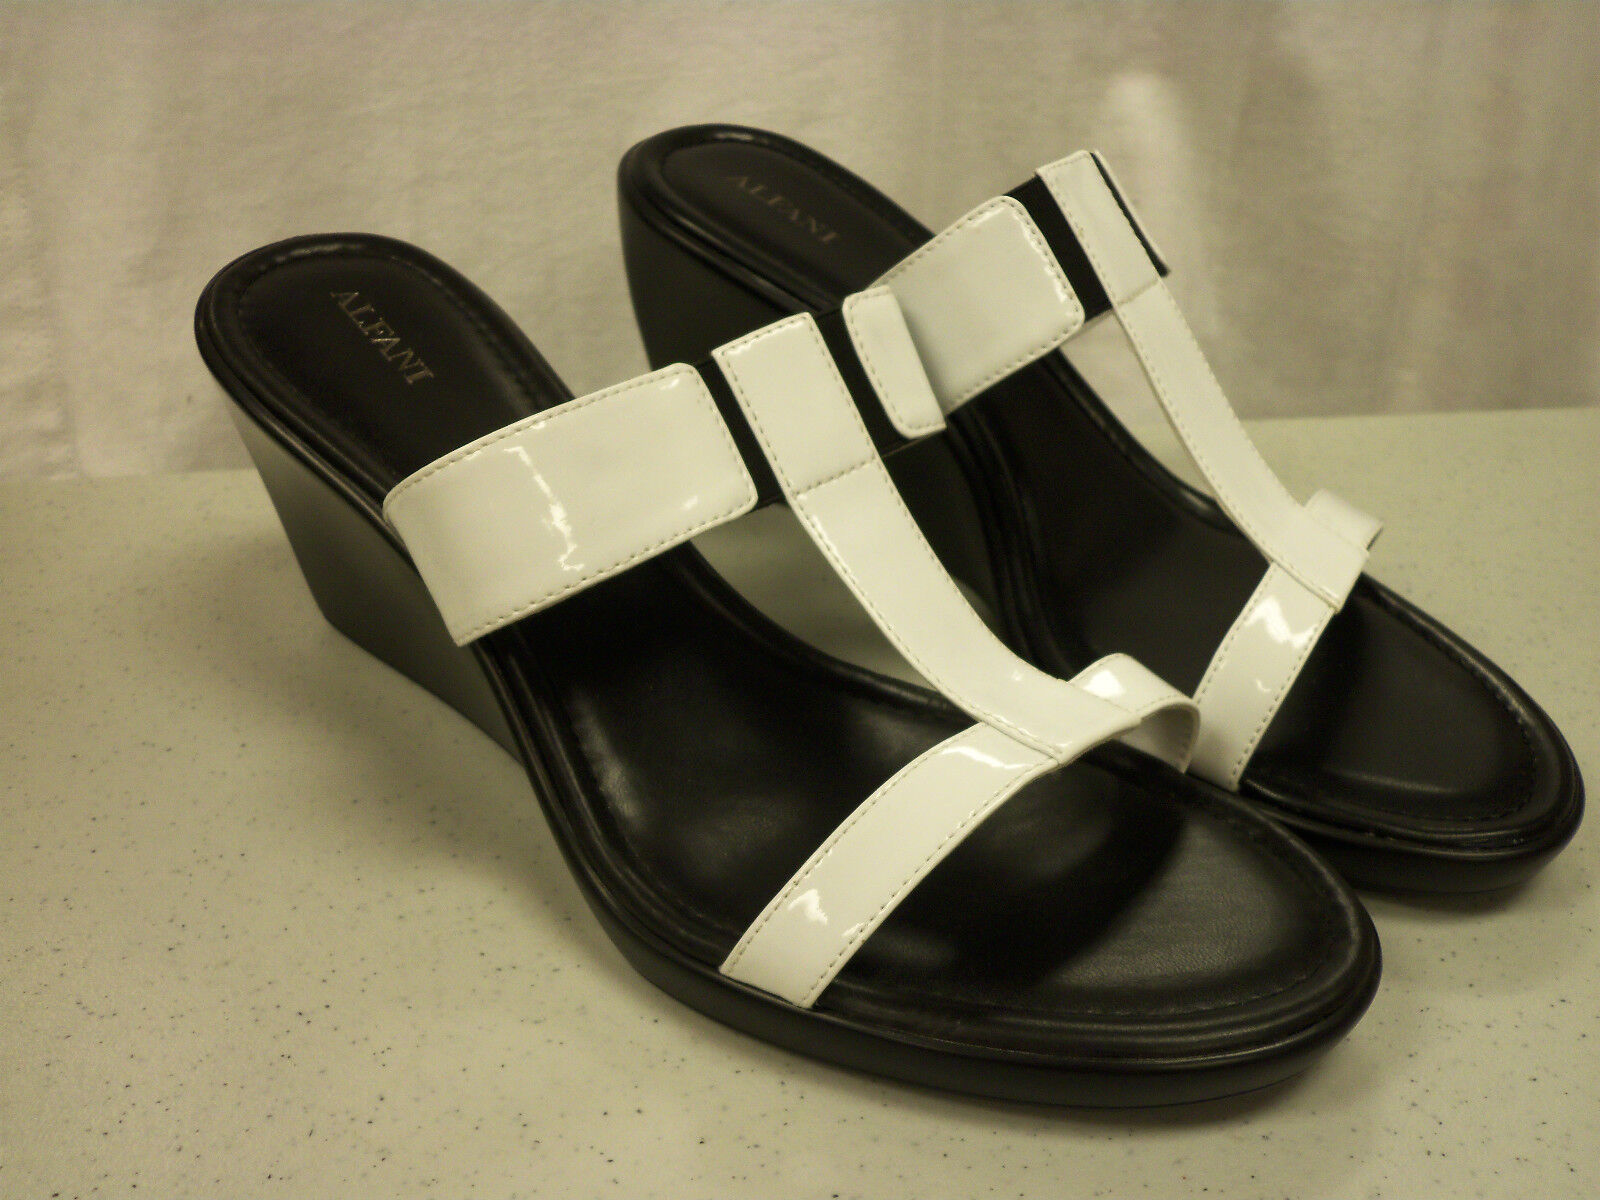 sconto online Alfani New New New donna Drivenwht bianca Wedges 11 Medium scarpe  punto vendita